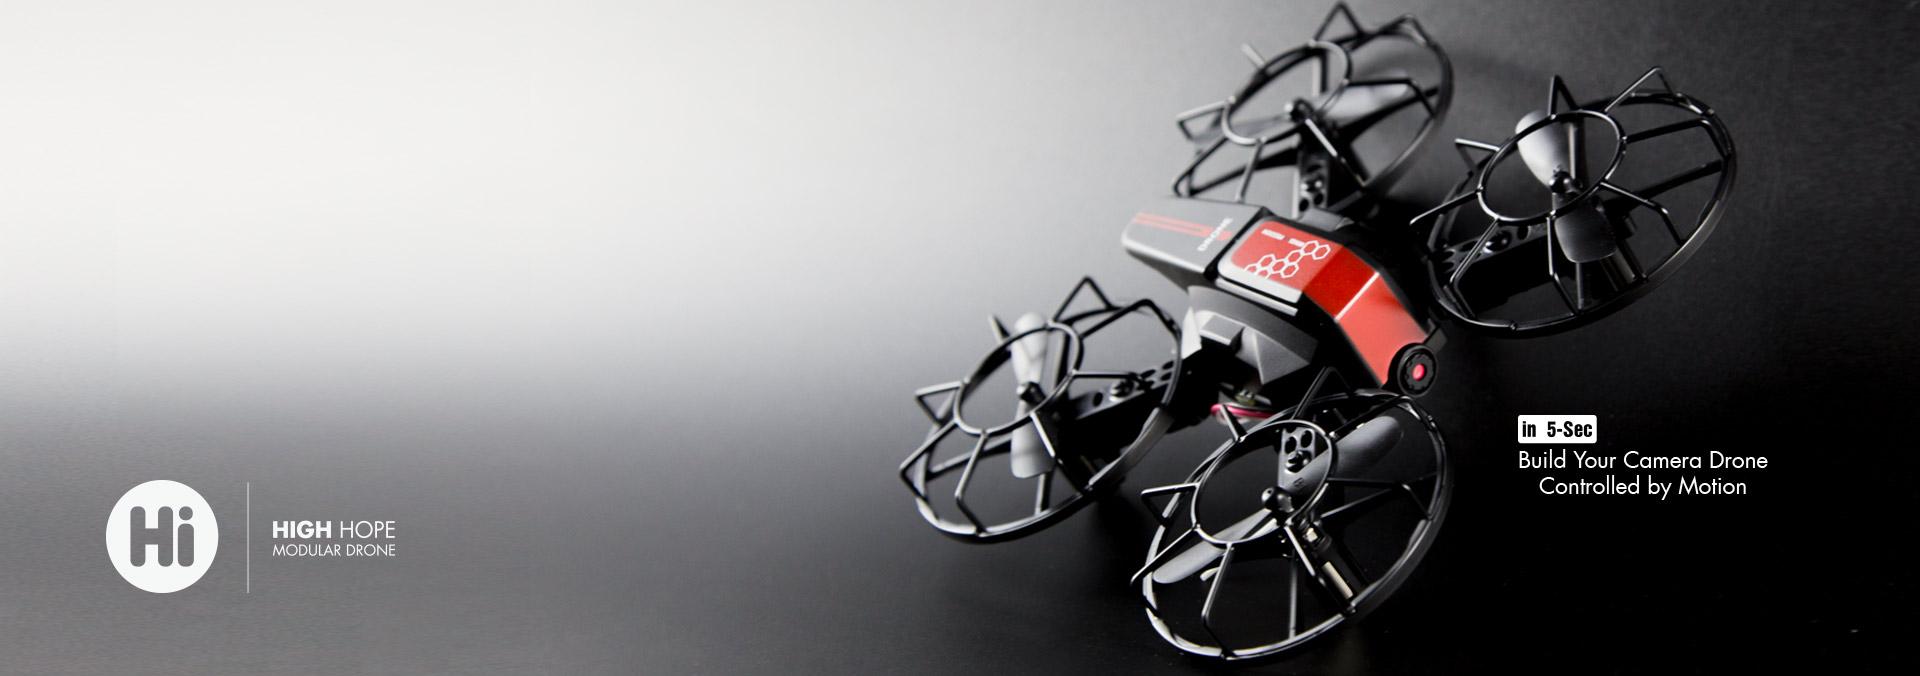 High Hope modular drone 81856-04